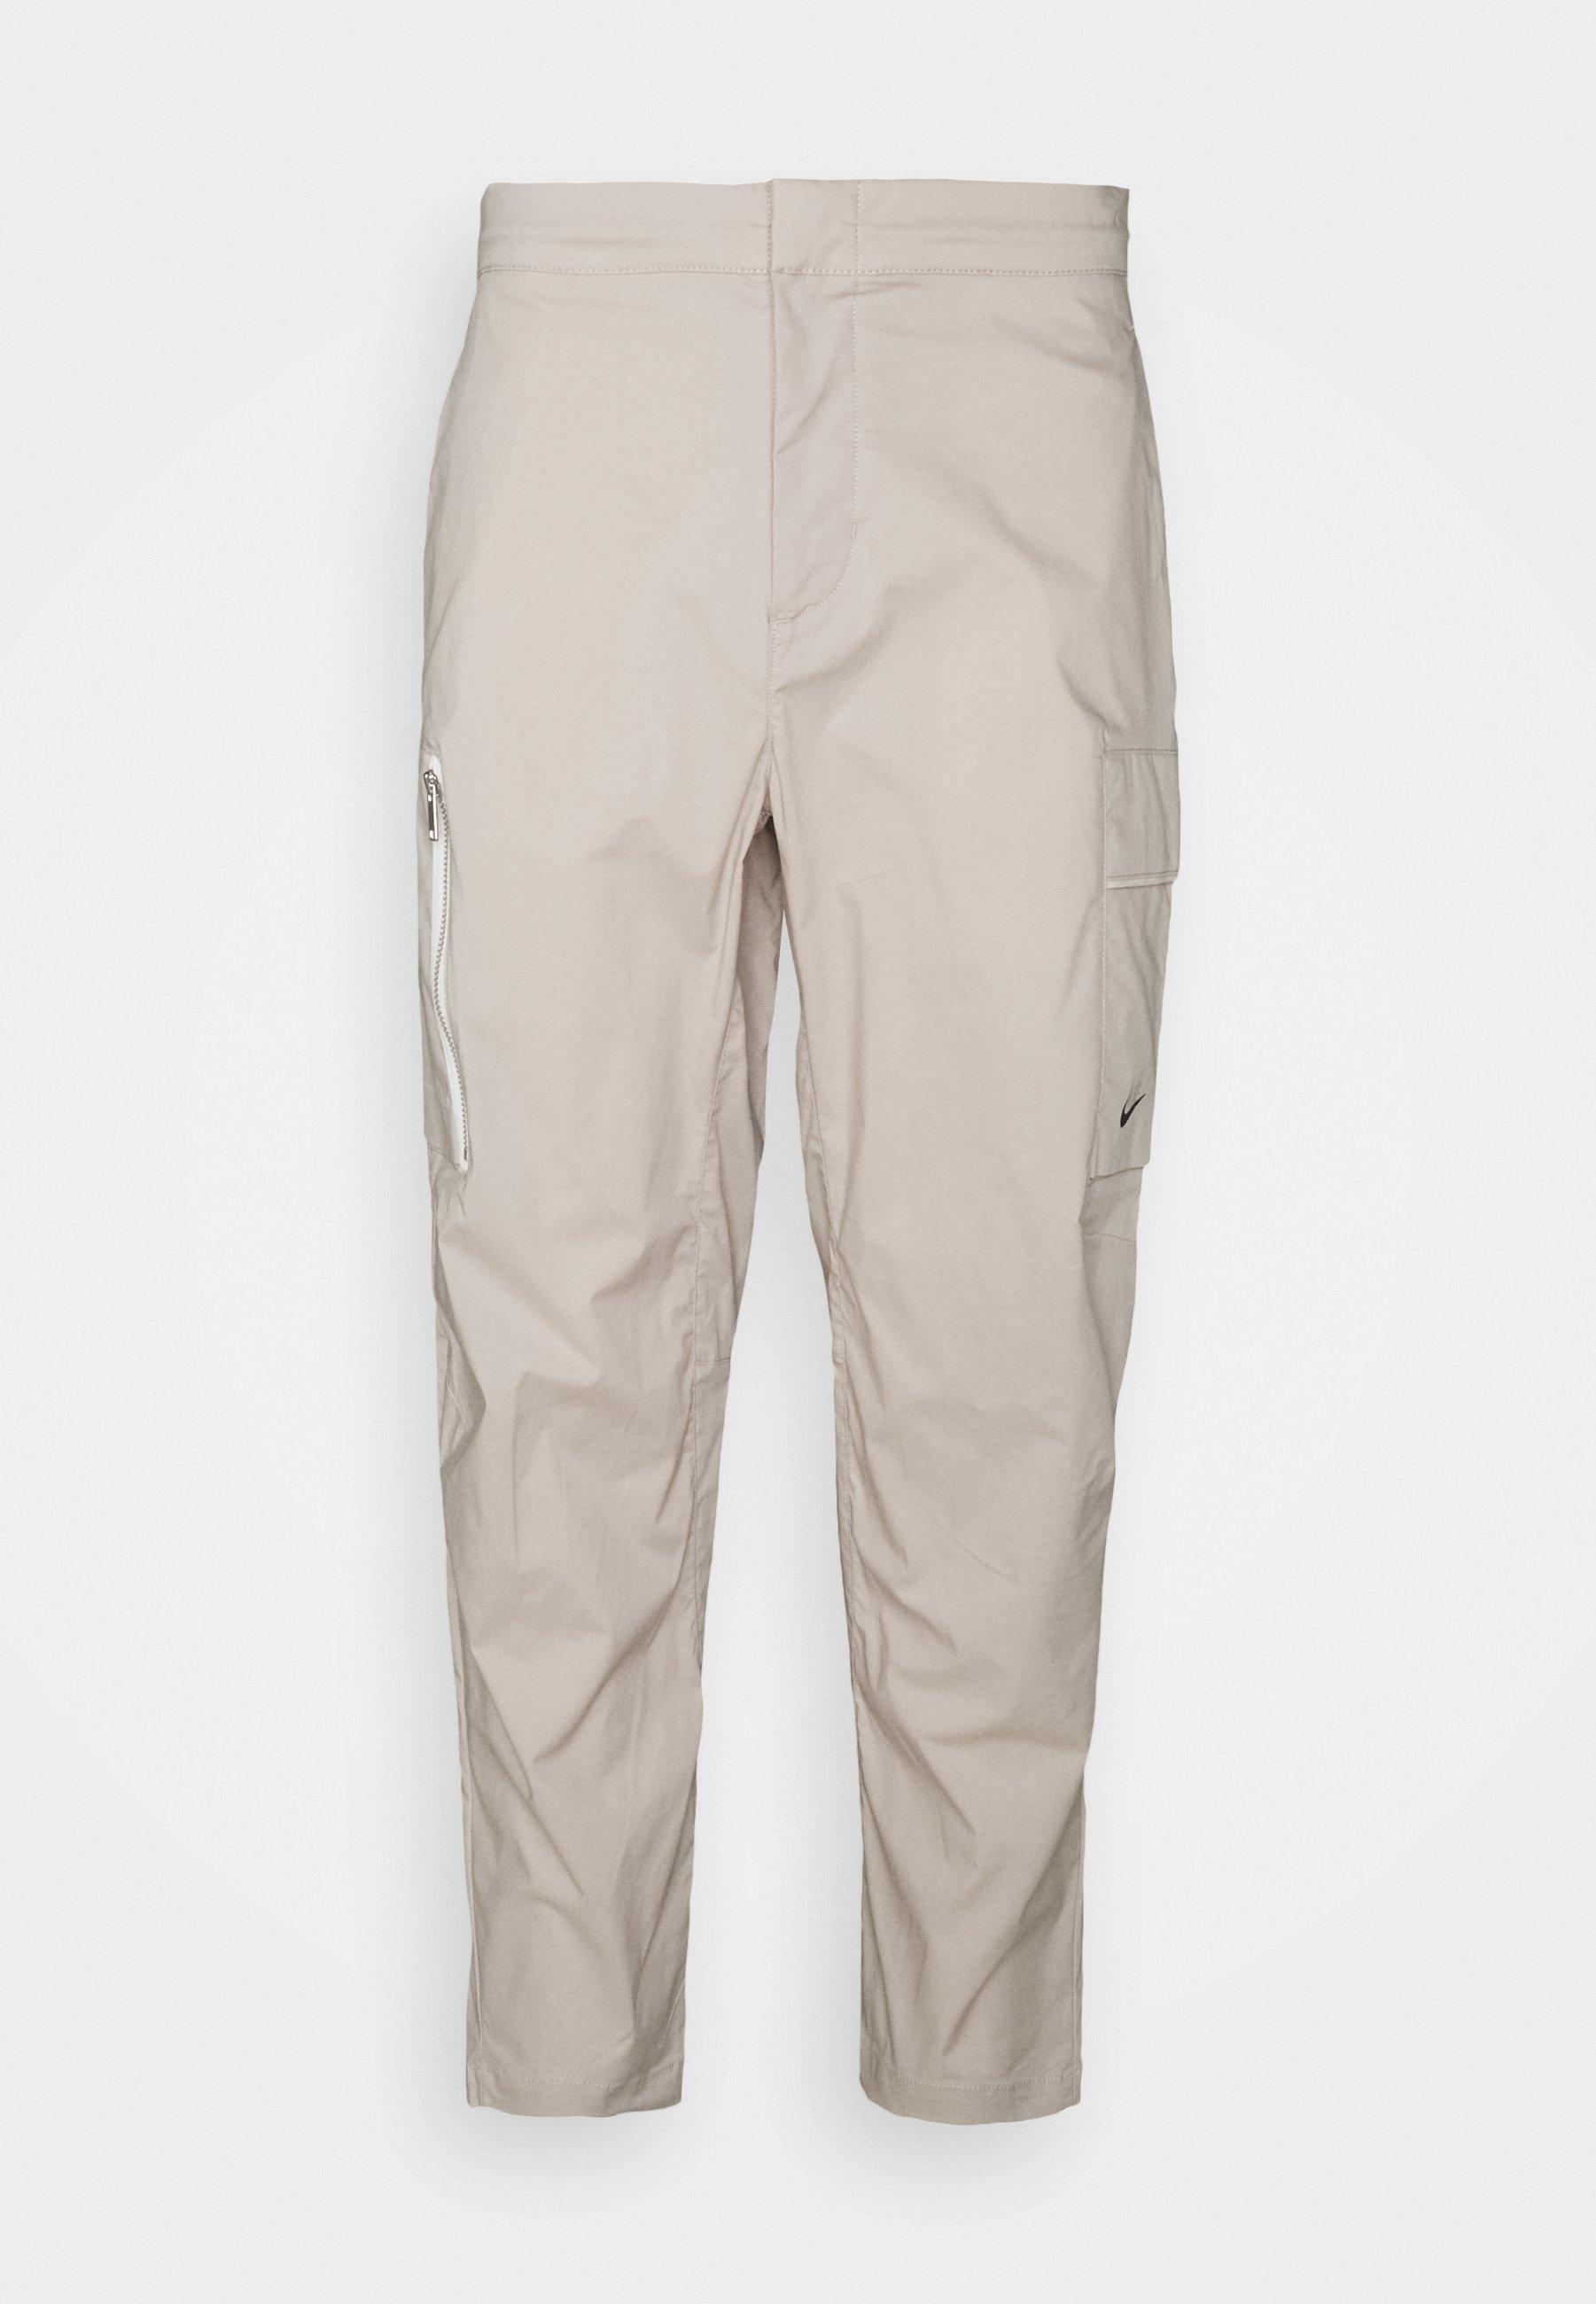 Homme UTILITY PANT - Pantalon cargo